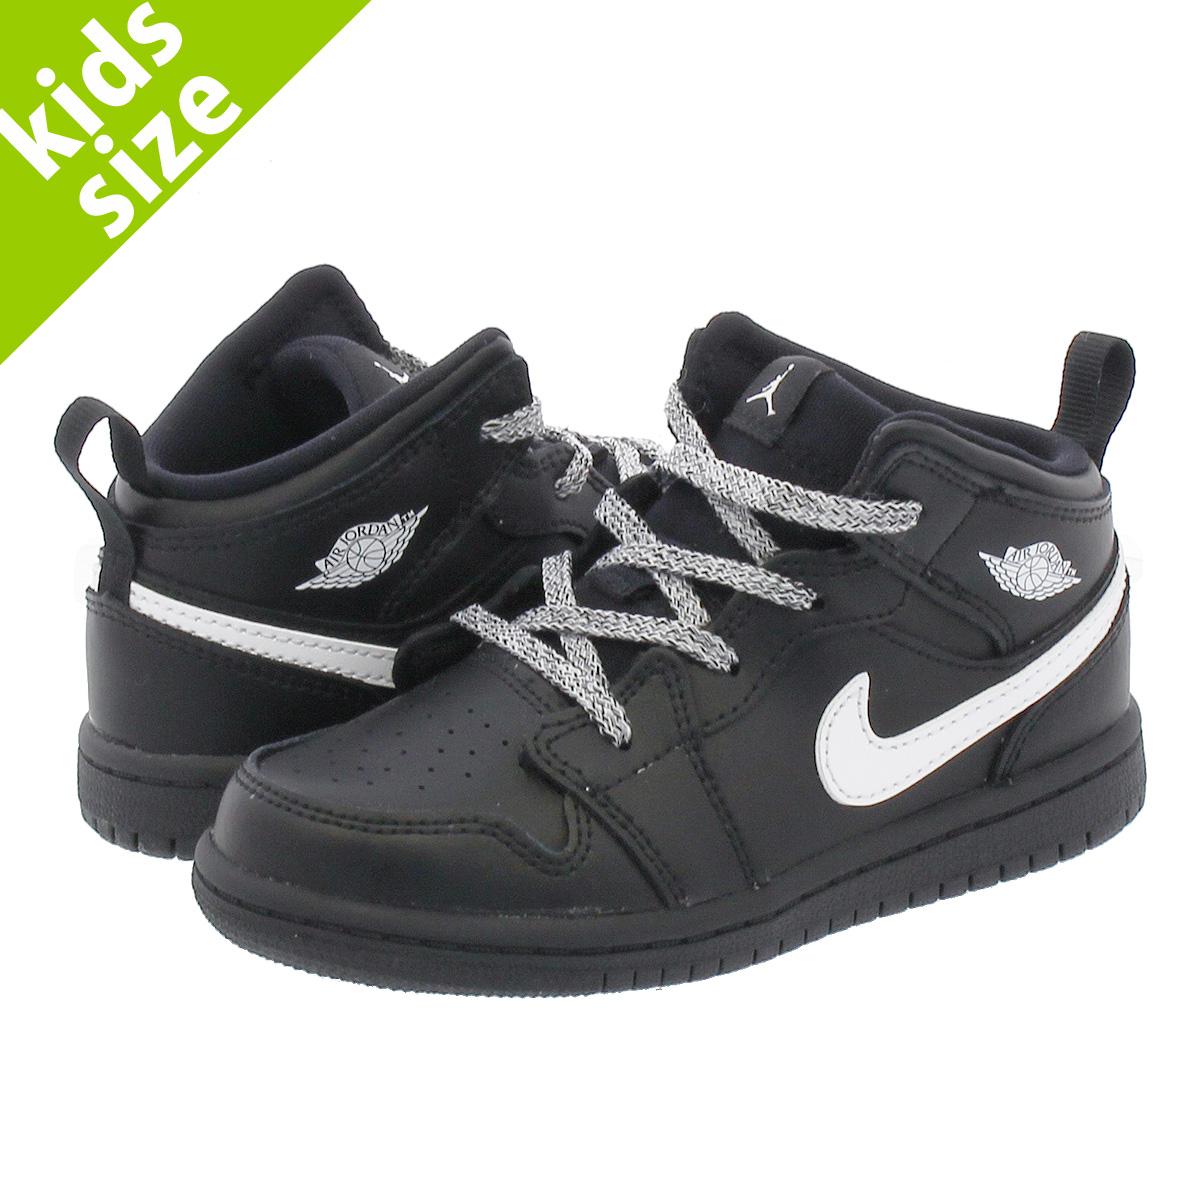 7ef14a9110 SELECT SHOP LOWTEX: NIKE AIR JORDAN 1 MID BT Nike Air Jordan 1 mid TD  BLACK/WHITE   Rakuten Global Market